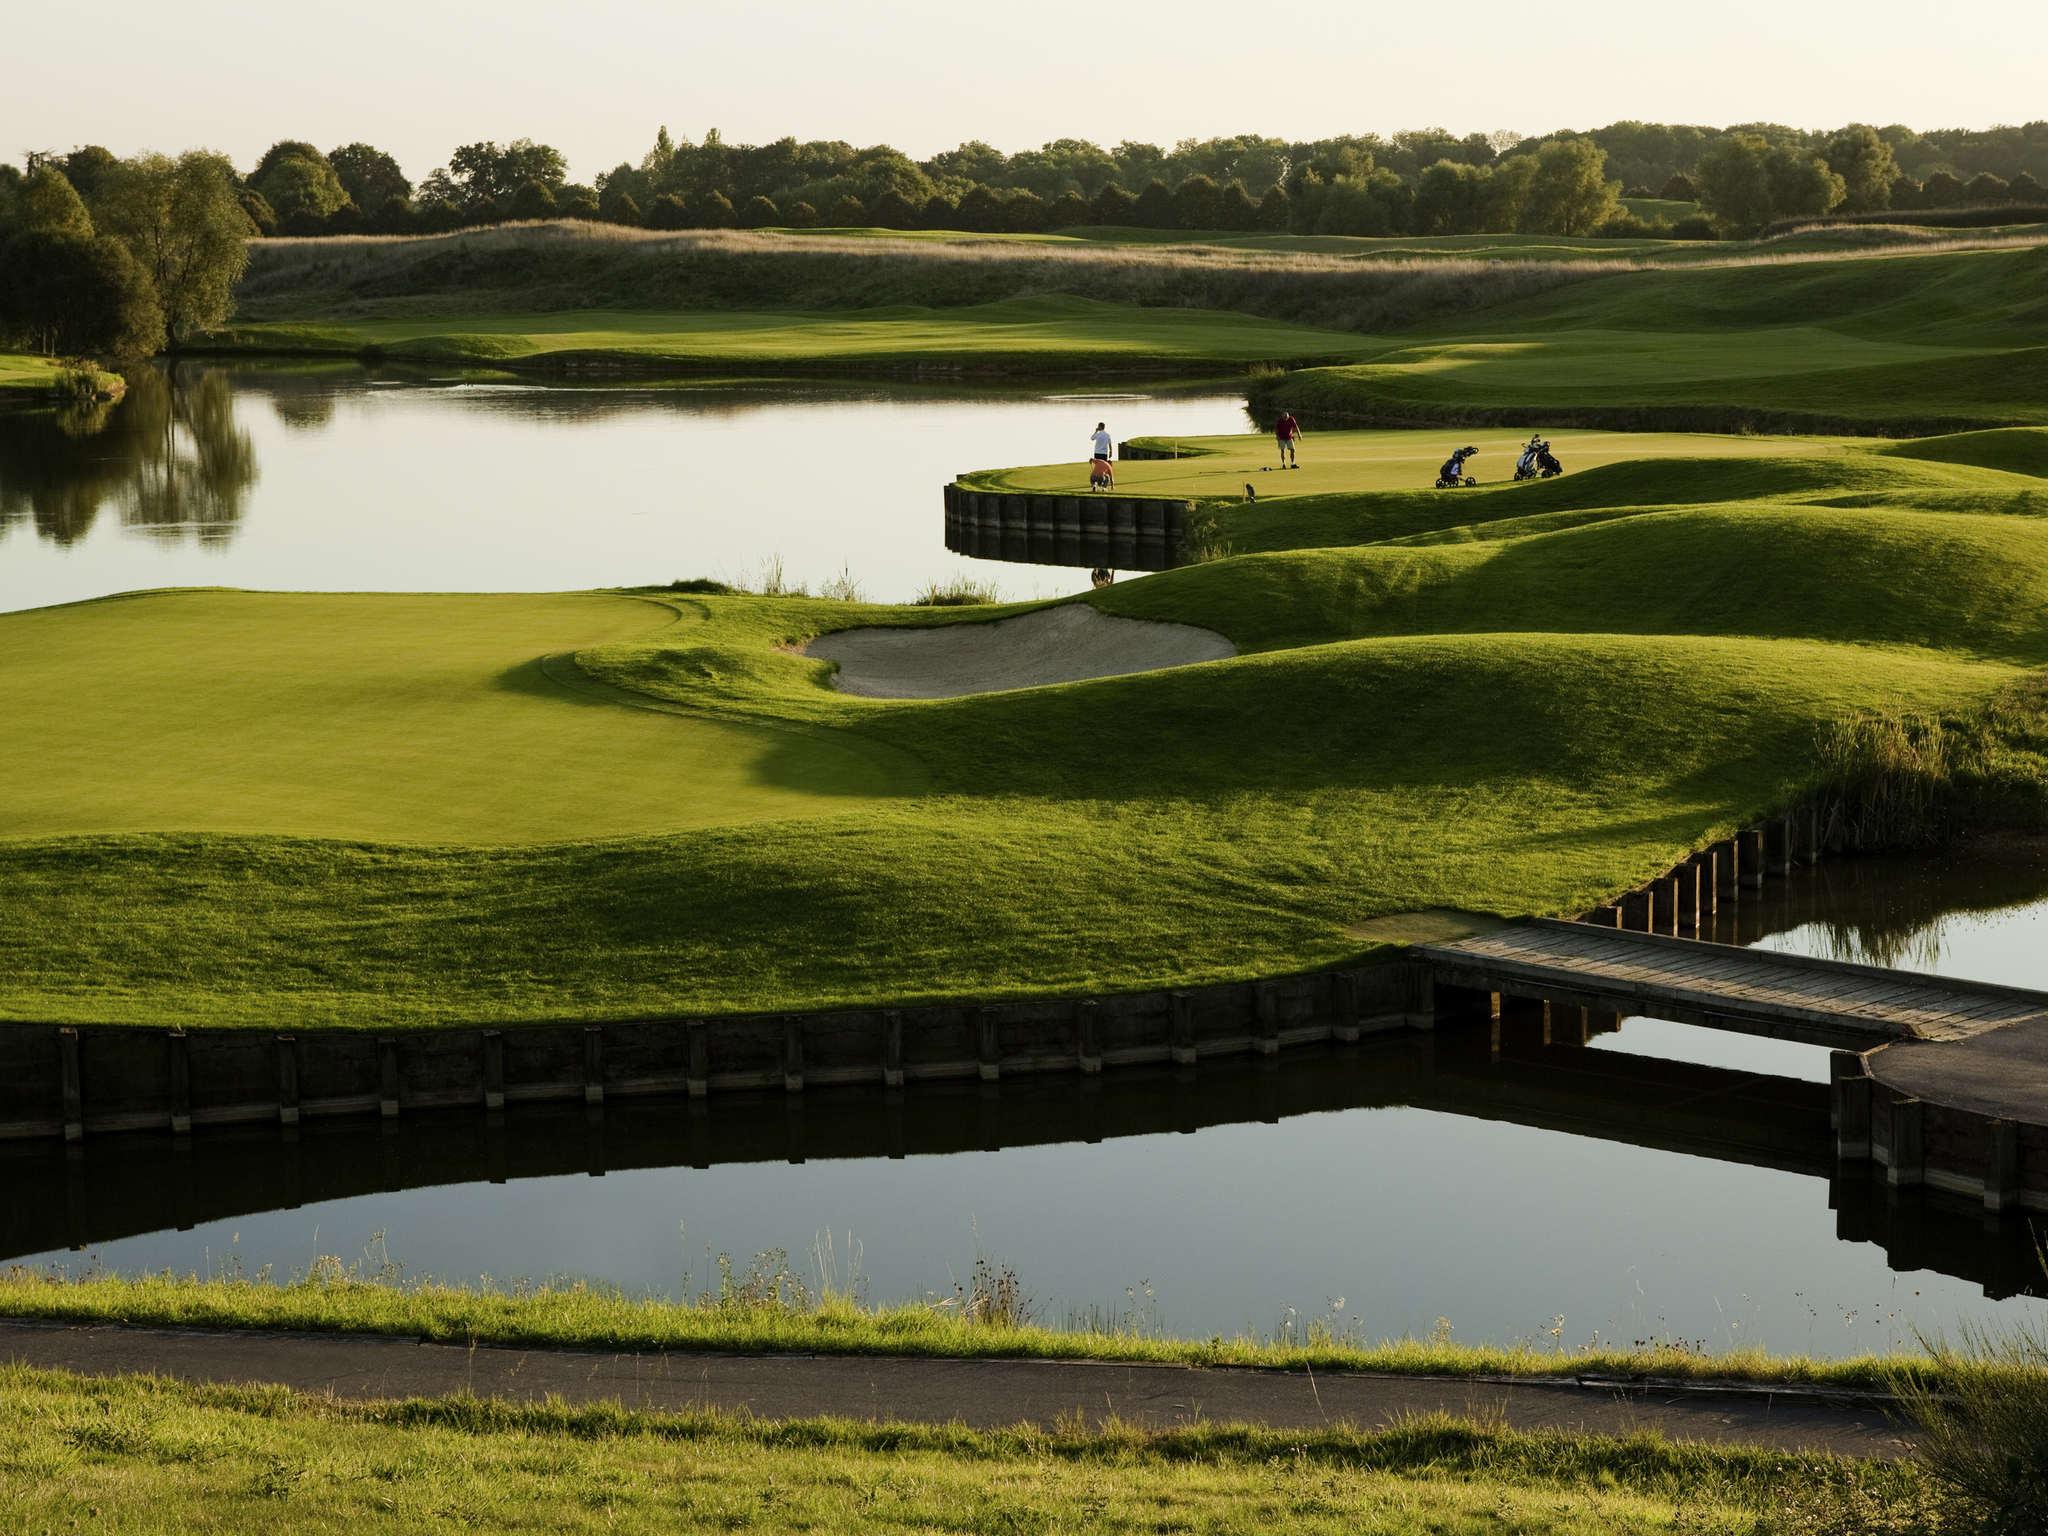 Hôtel - Novotel Saint-Quentin Golf National